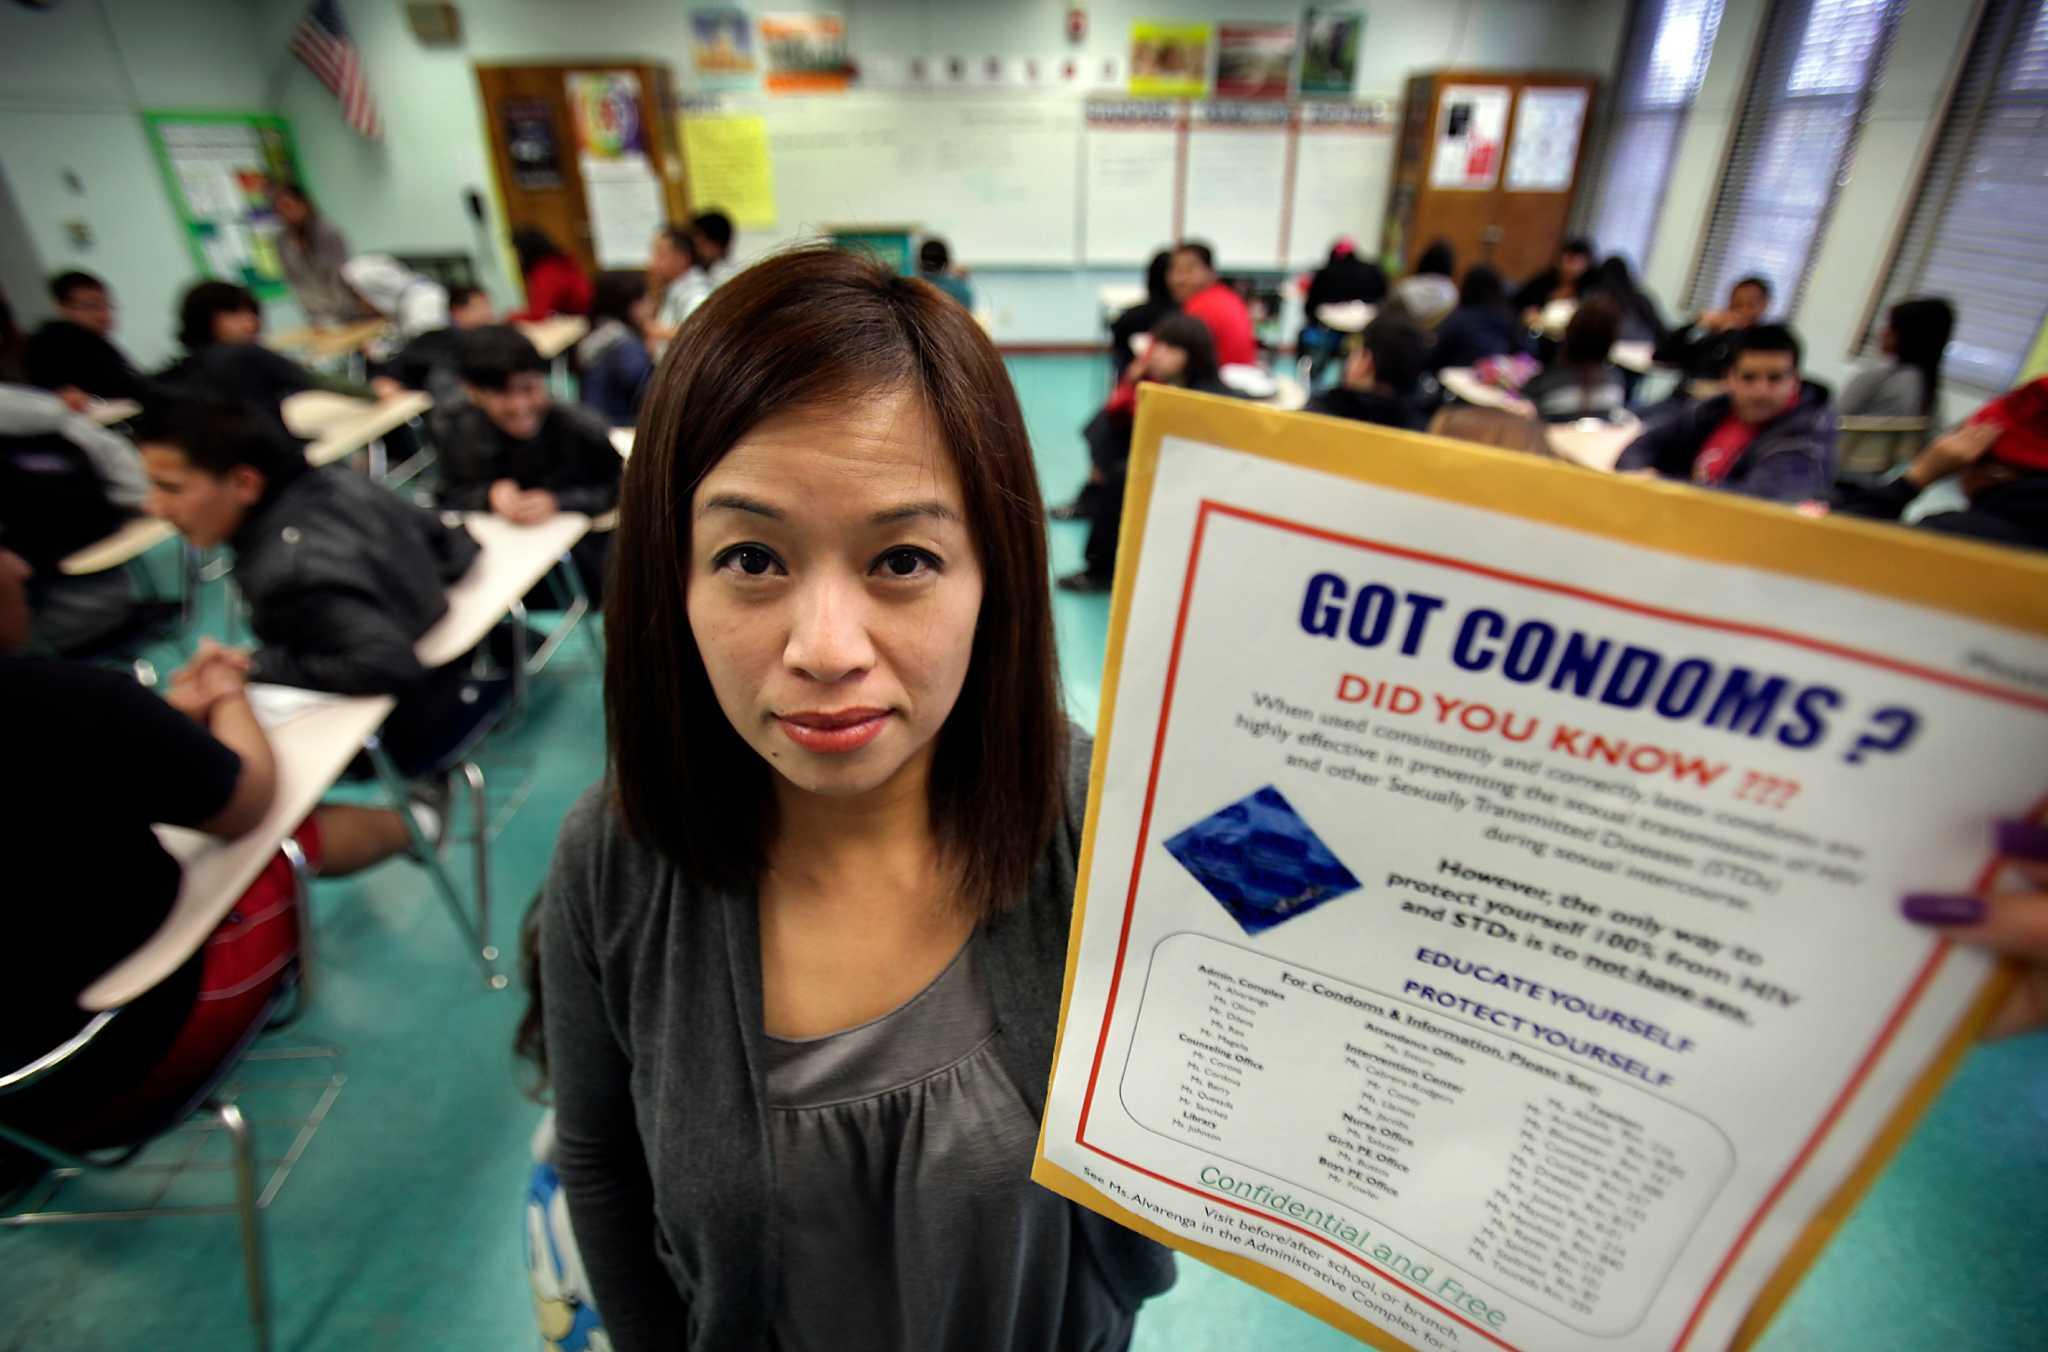 distribution of condoms in schools debate philippines